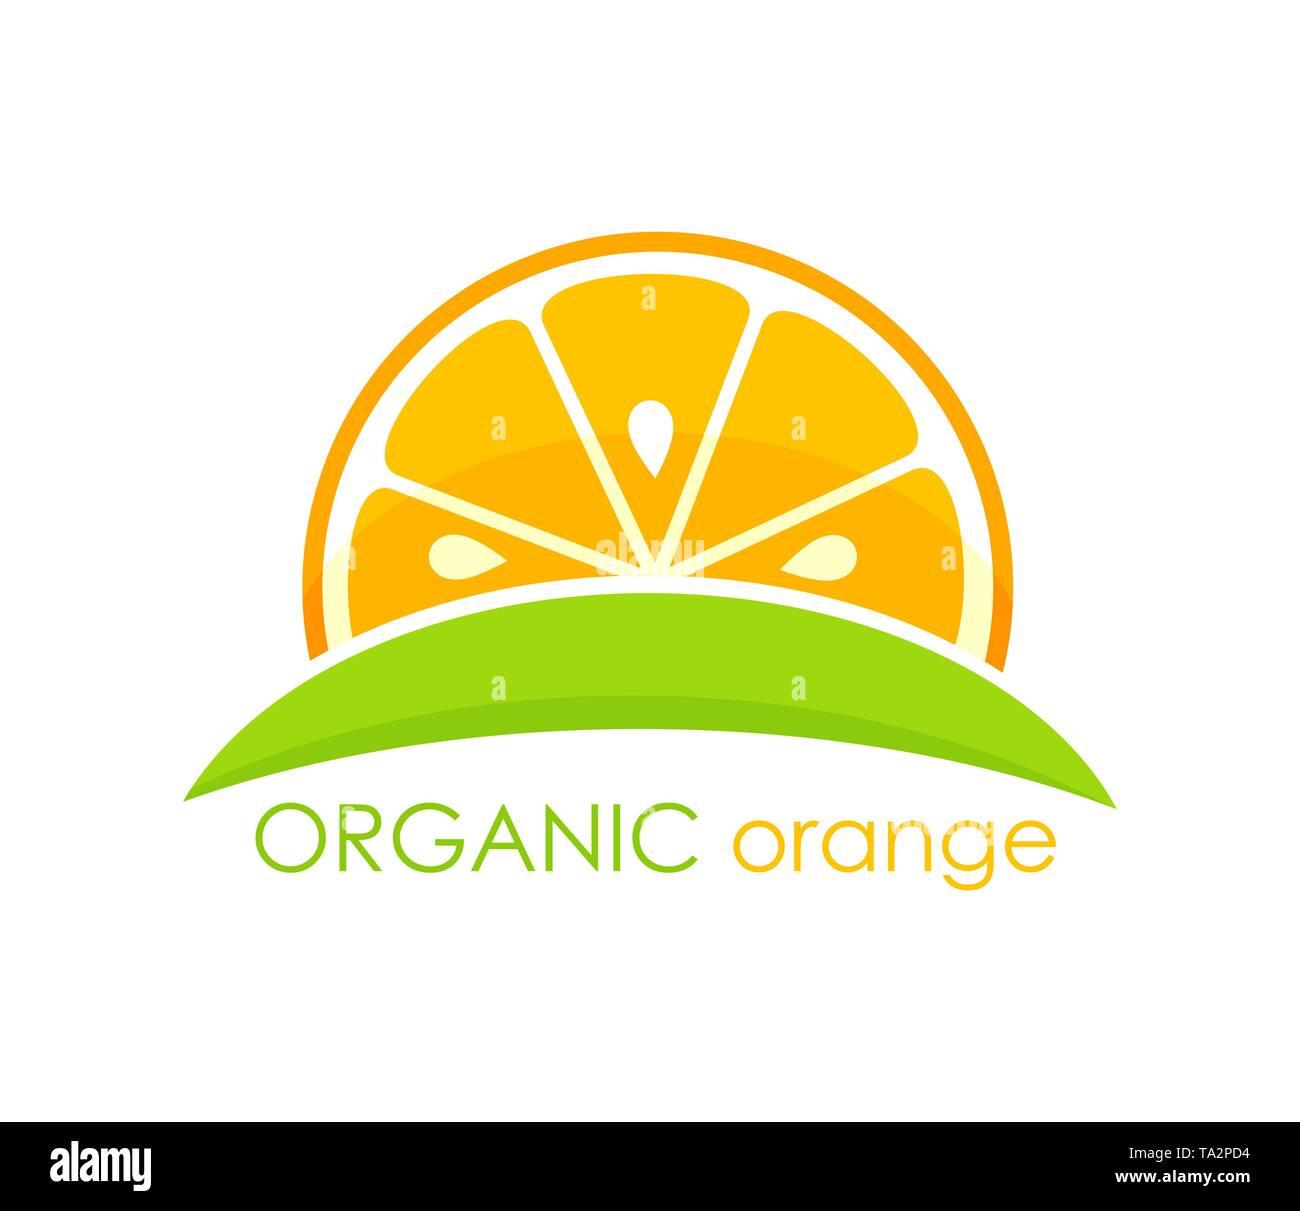 Organic orange symbol. Vector illustration - Stock Image